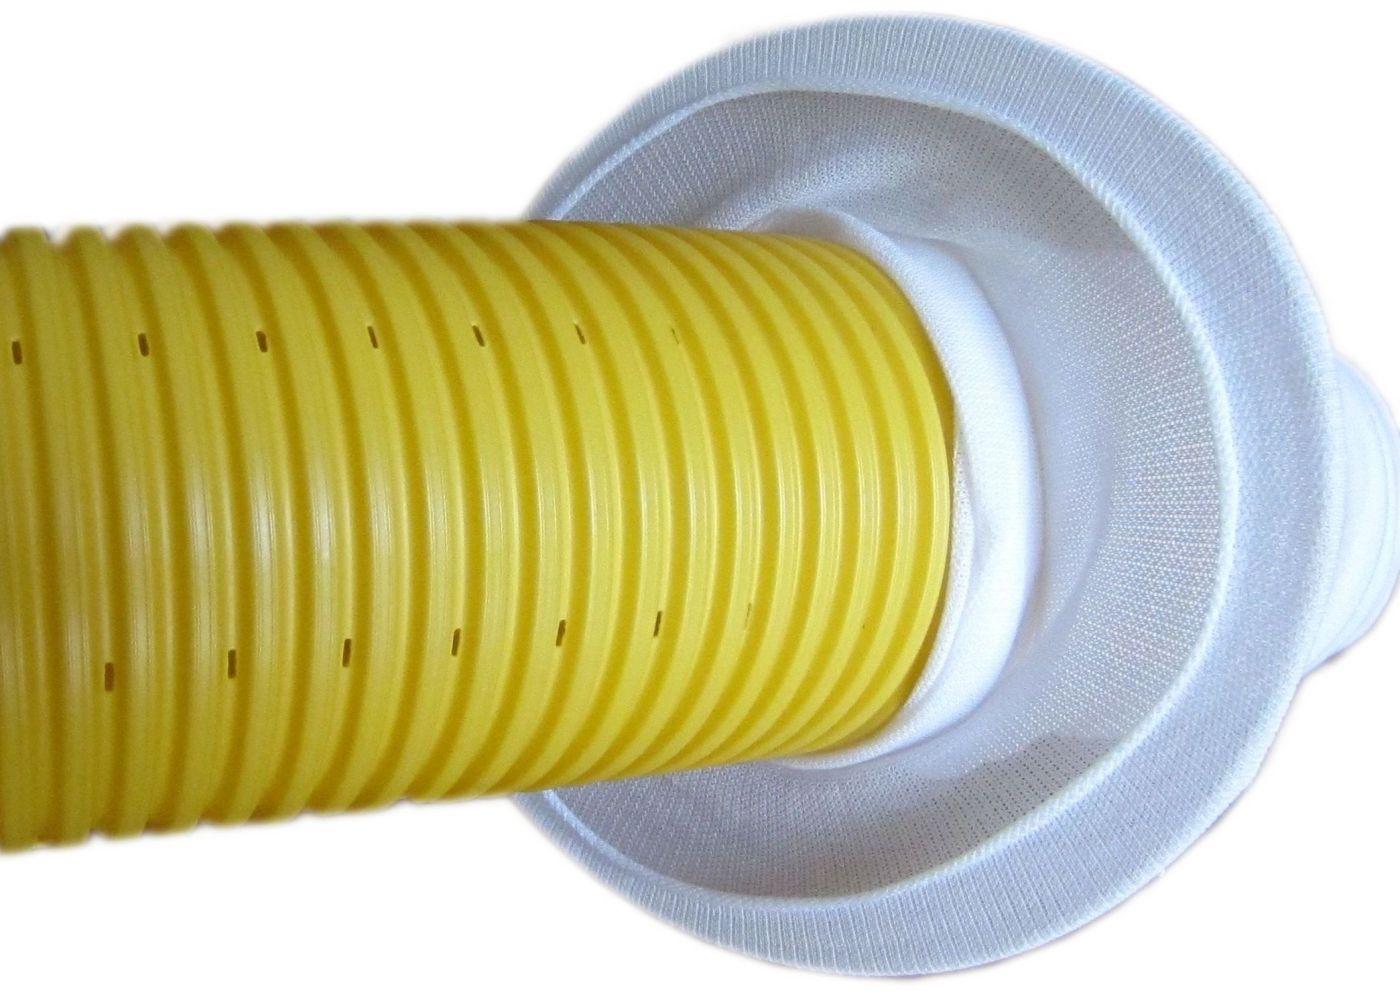 50 m drainage filter sock drain sleeve for drainage pipes dn 80 wetzel technische netze. Black Bedroom Furniture Sets. Home Design Ideas